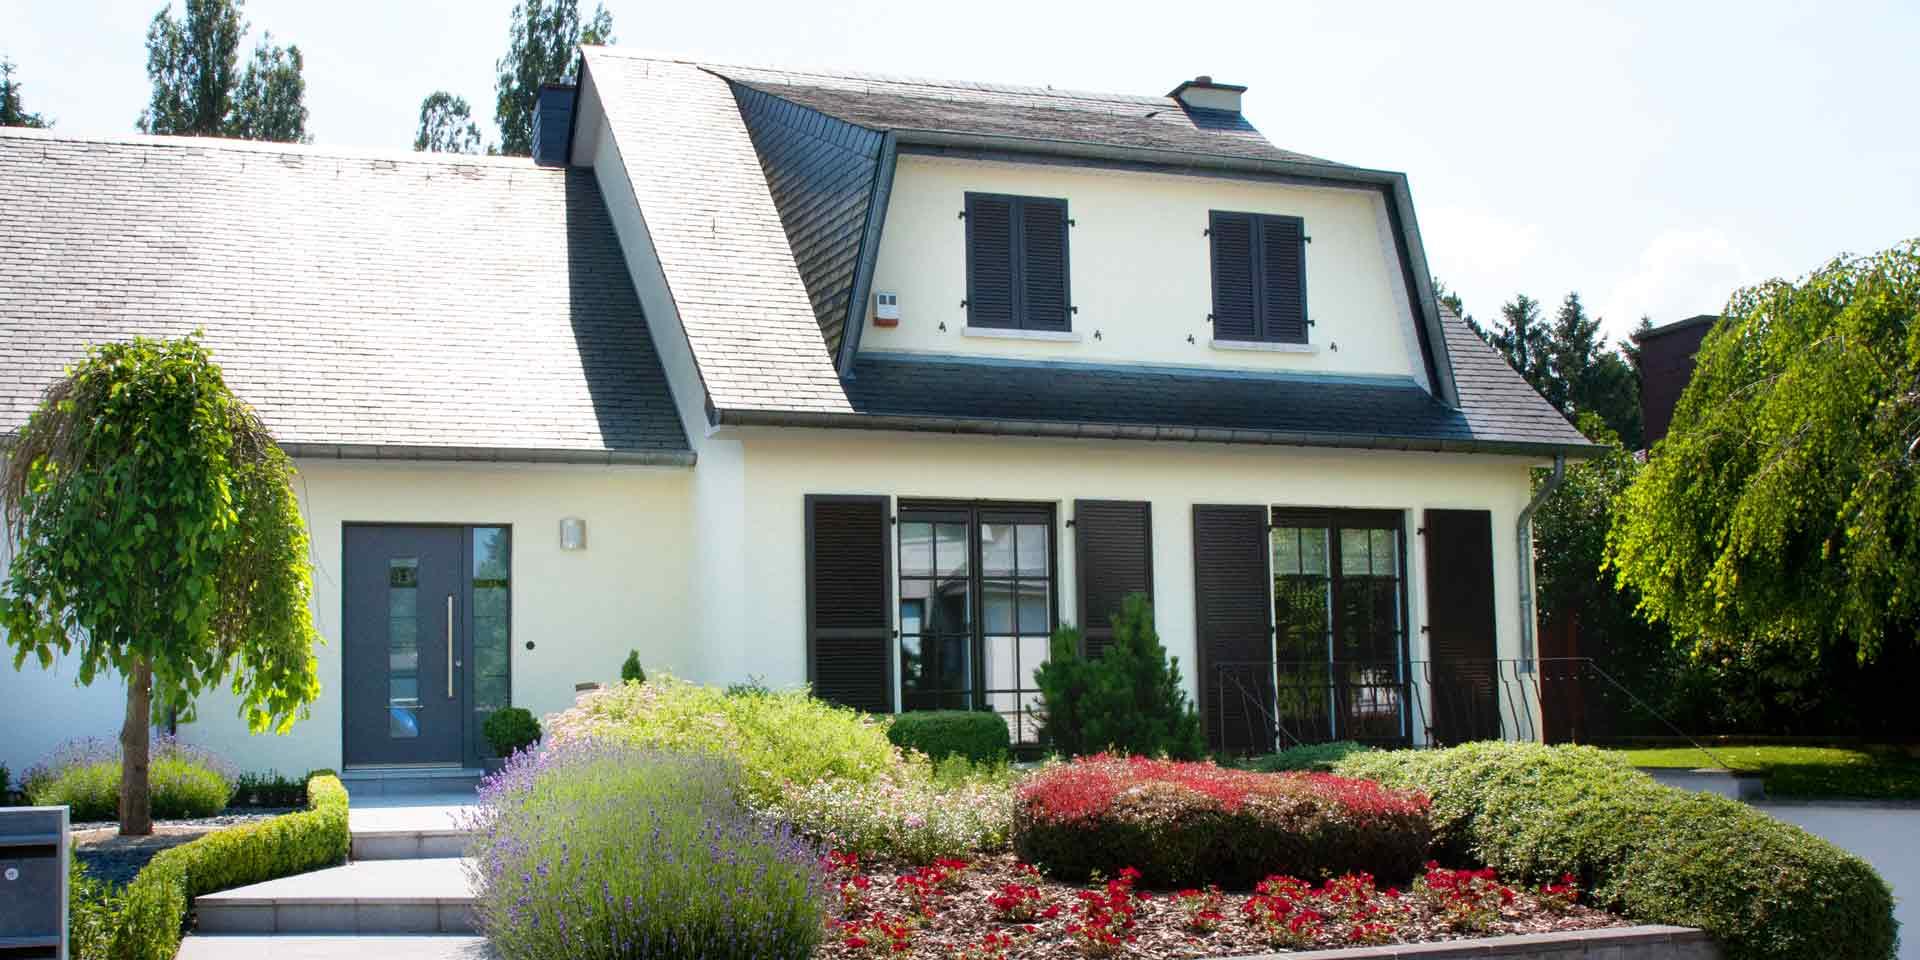 Rotes Haus Graue Fenster